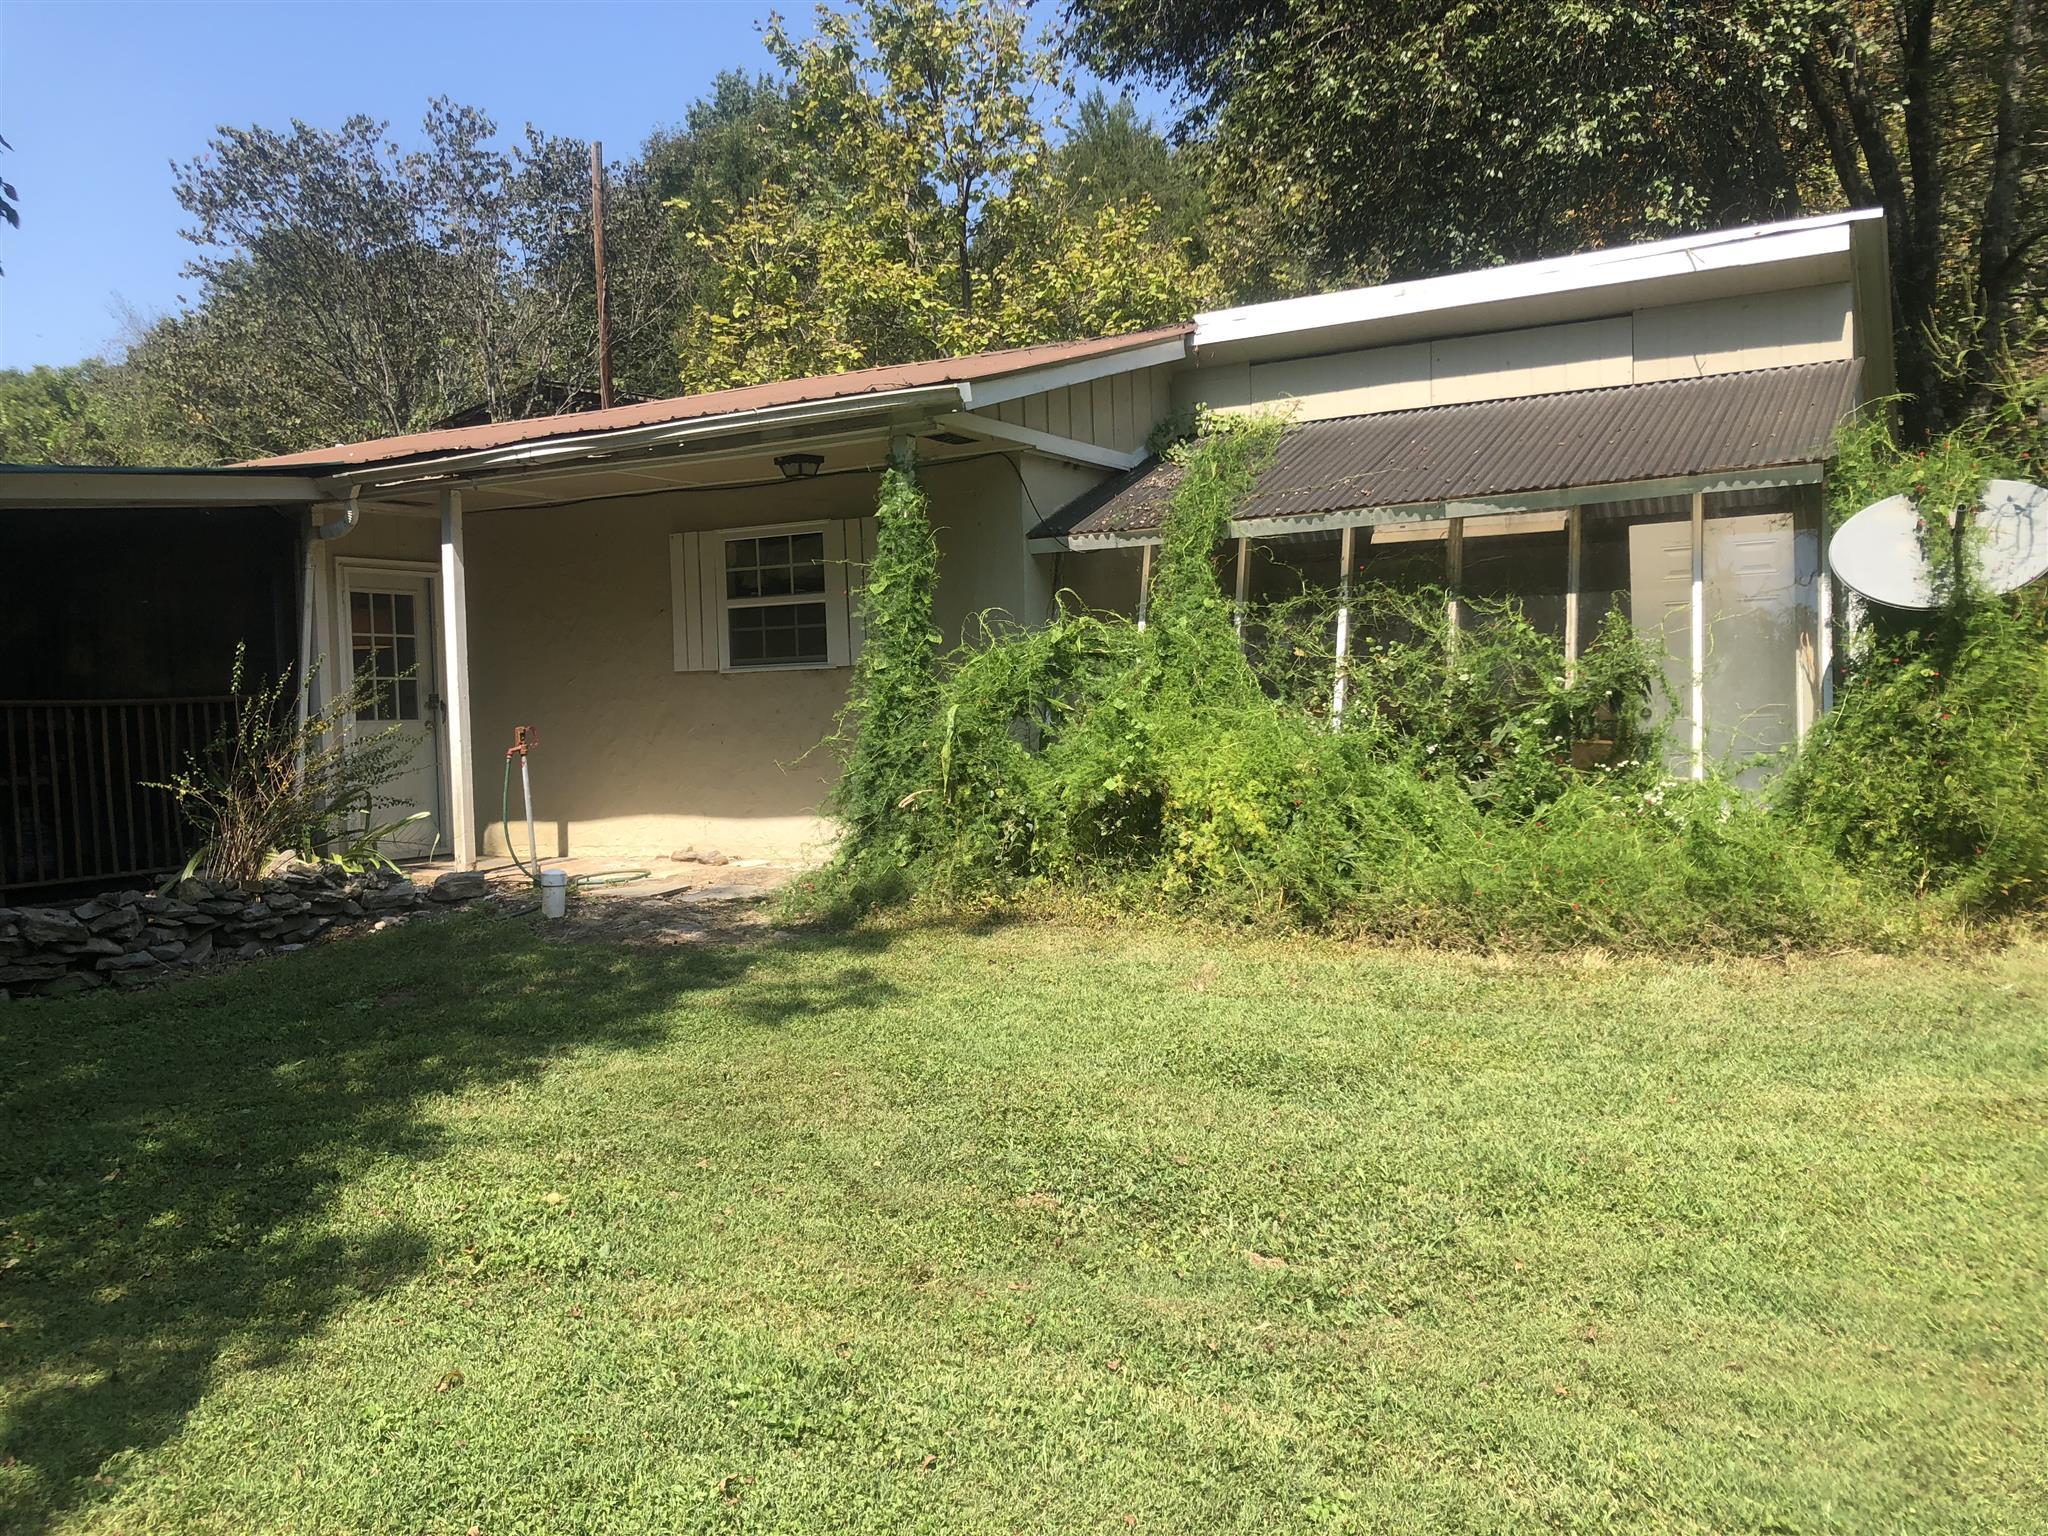 949 Spring Fork Rd, Granville, TN 38564 - Granville, TN real estate listing